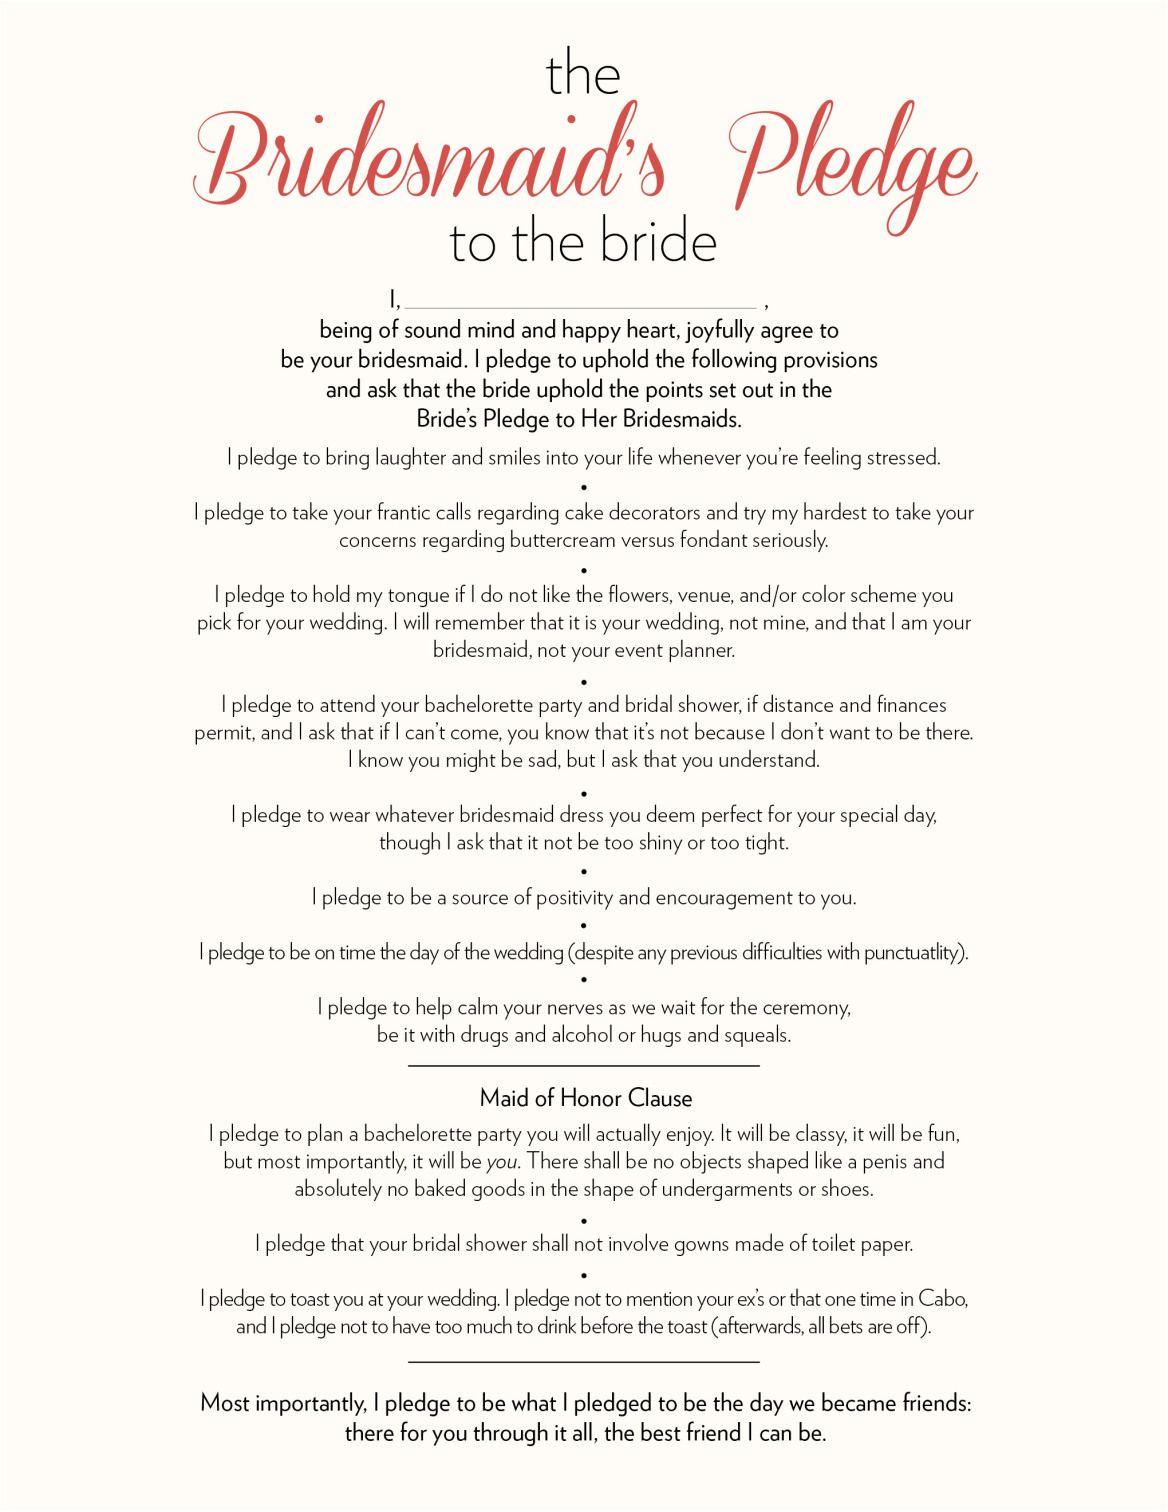 The Bridesmaids Pledge to the Bride | Wedding speech